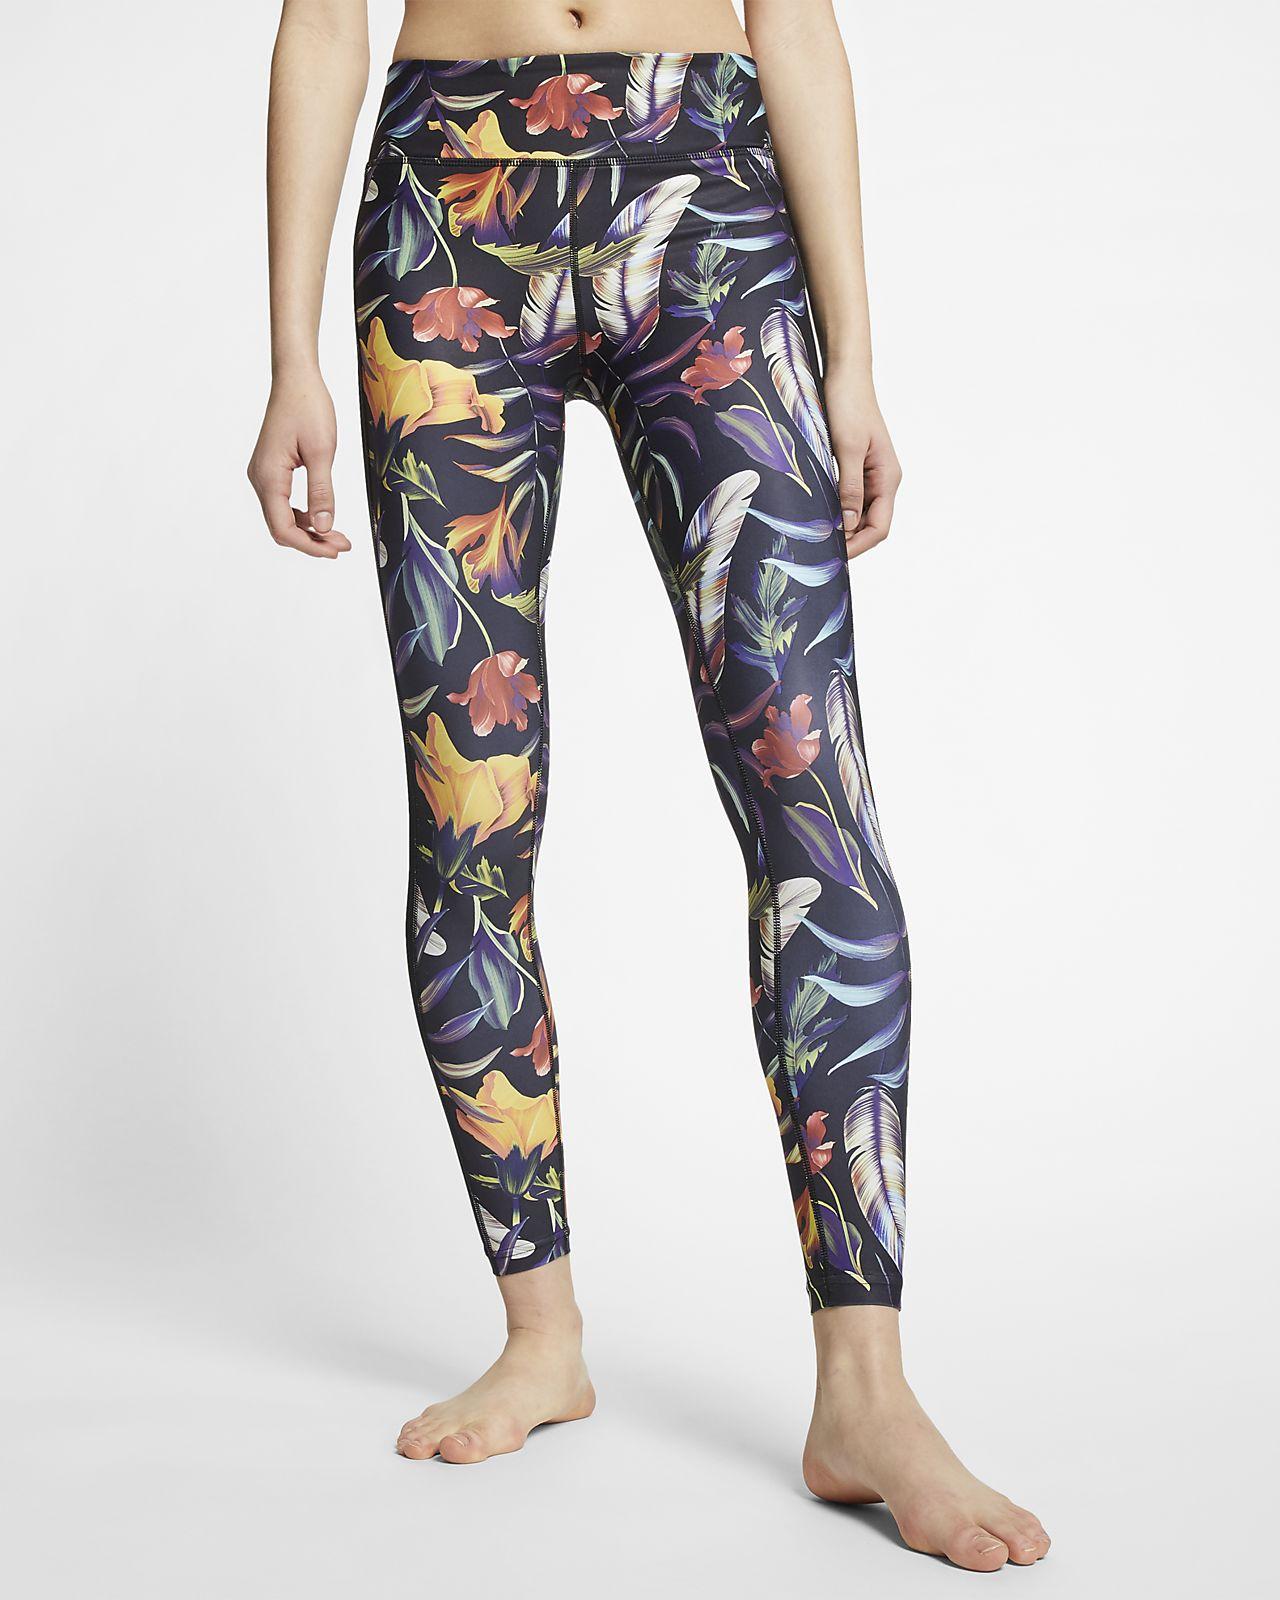 Hurley Quick Dry Surf-Leggings mit Floralmuster für Damen